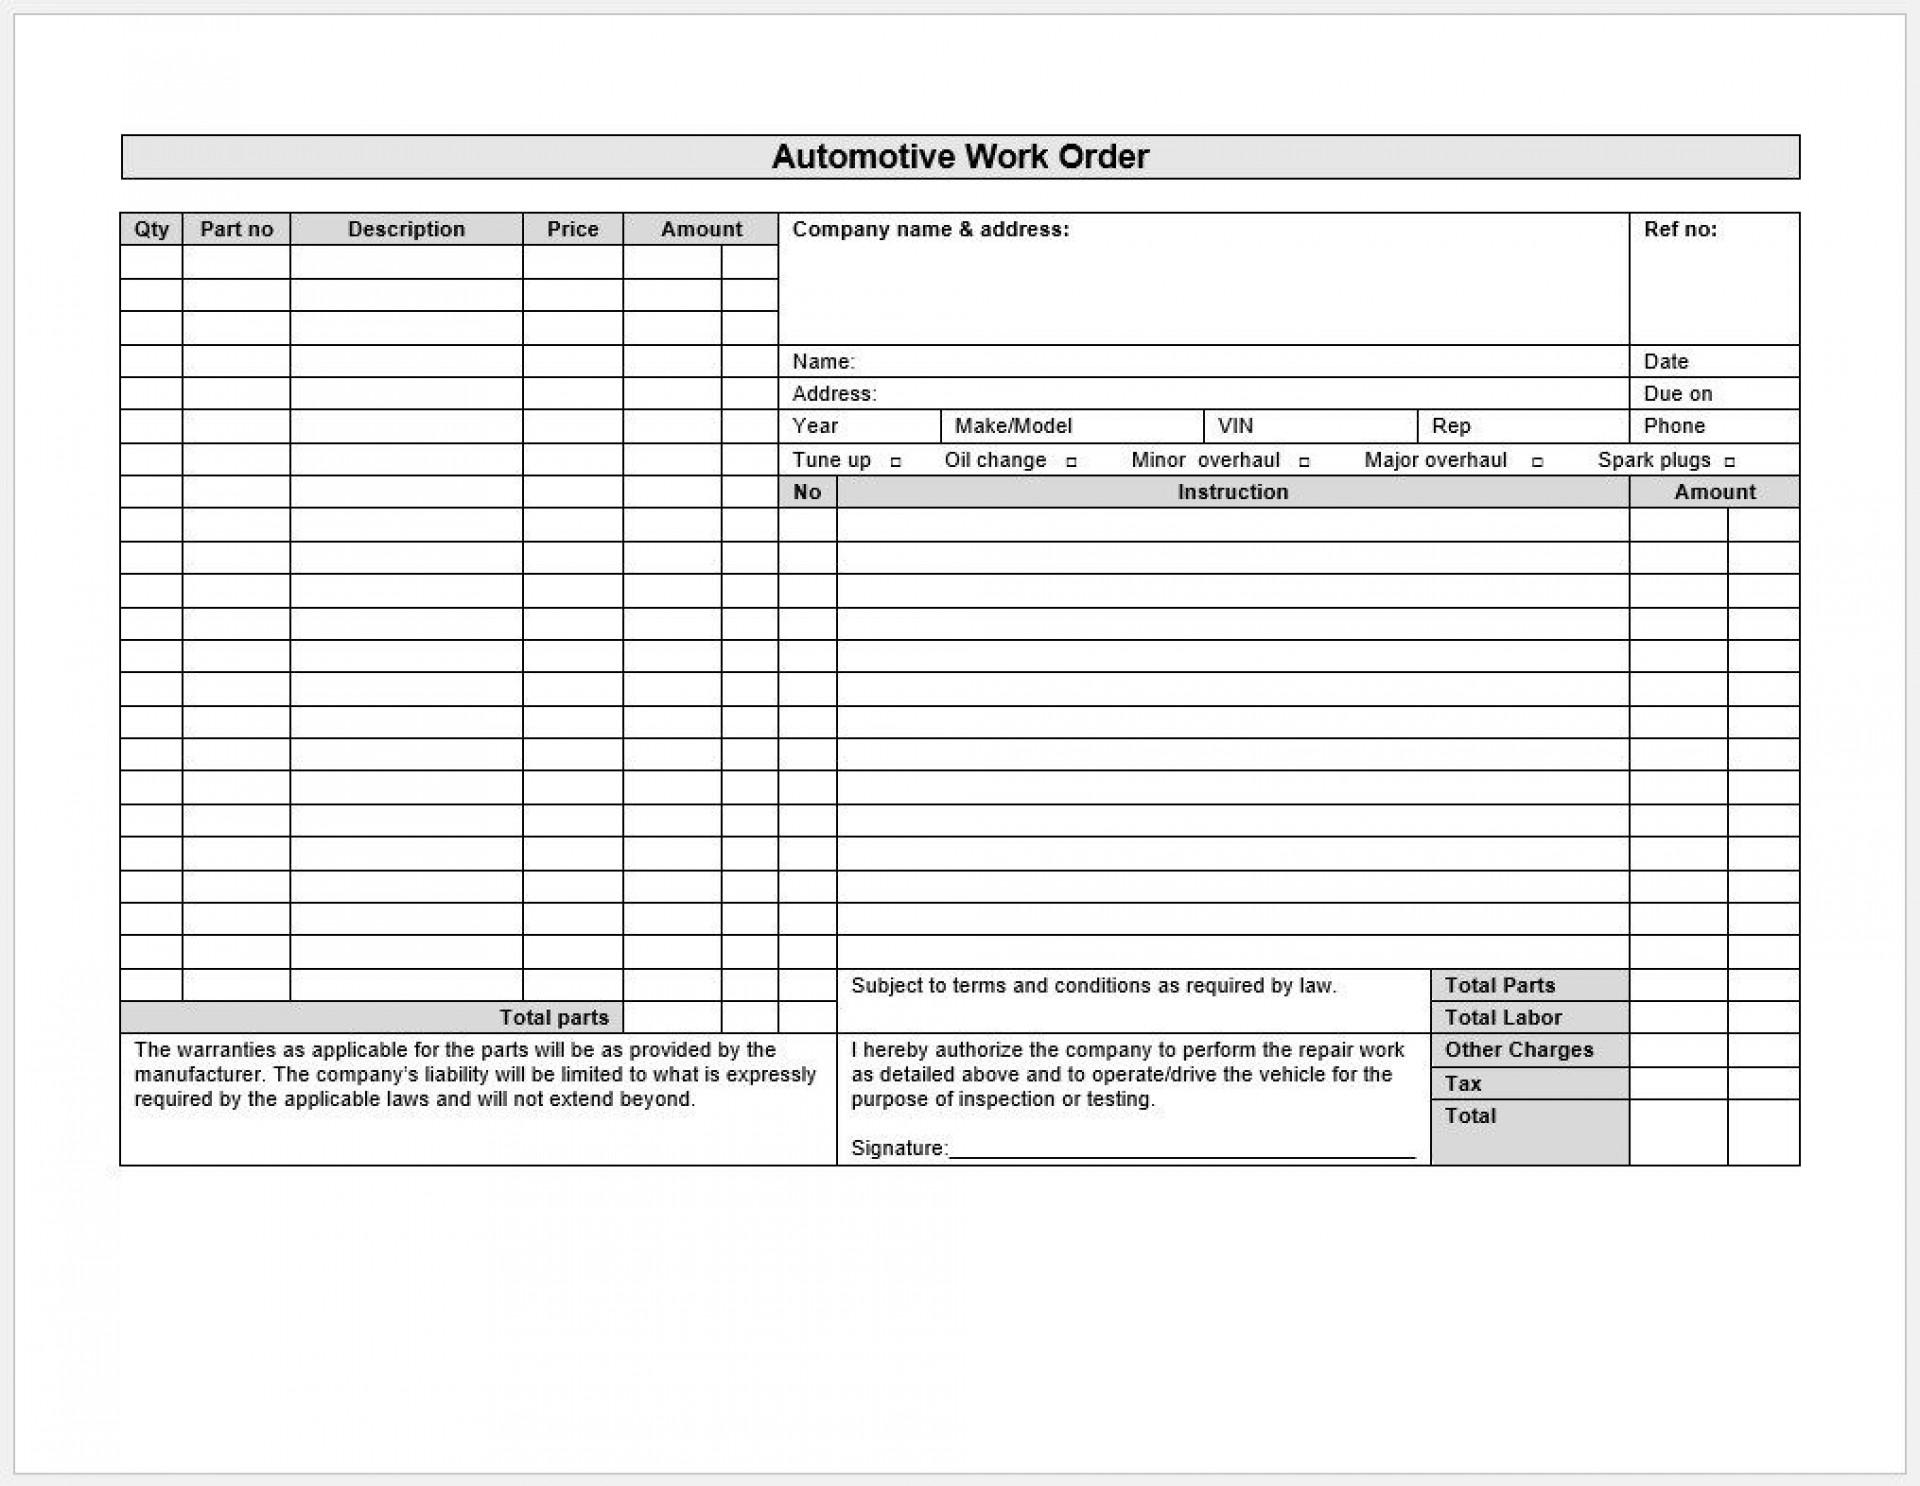 007 Breathtaking Microsoft Excel Work Order Template High Resolution 1920